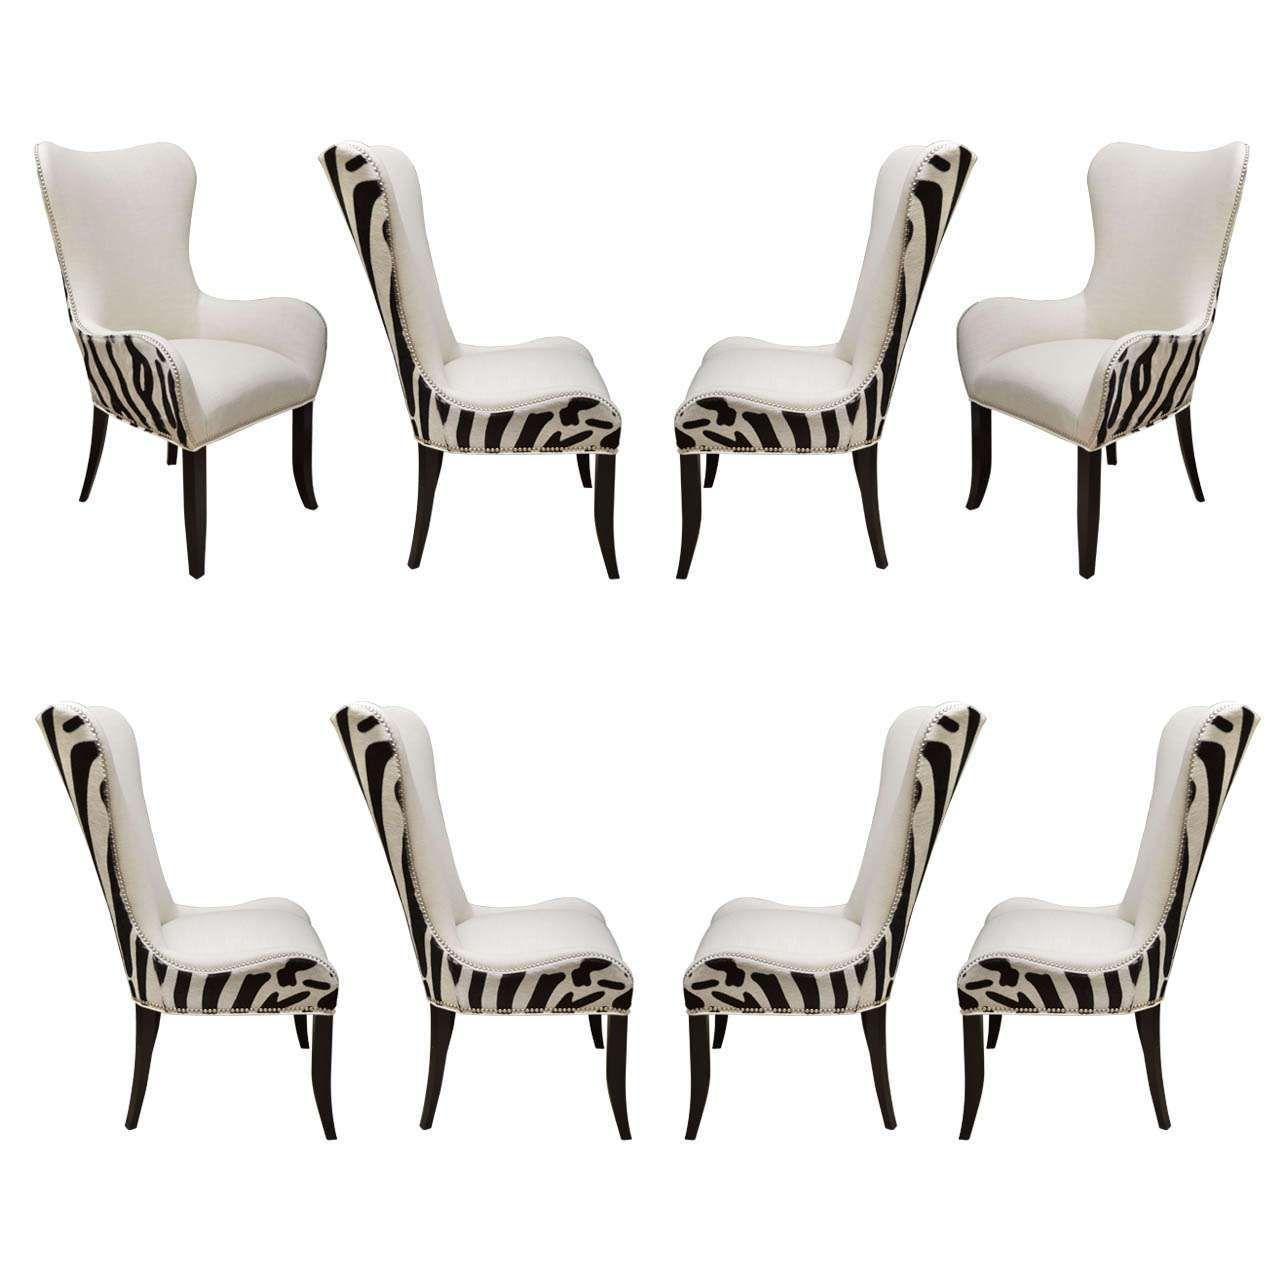 Pinsurat Khan On Dining Room  Shuoruicn  Pinterest  Room Enchanting Zebra Dining Room Chairs Design Ideas